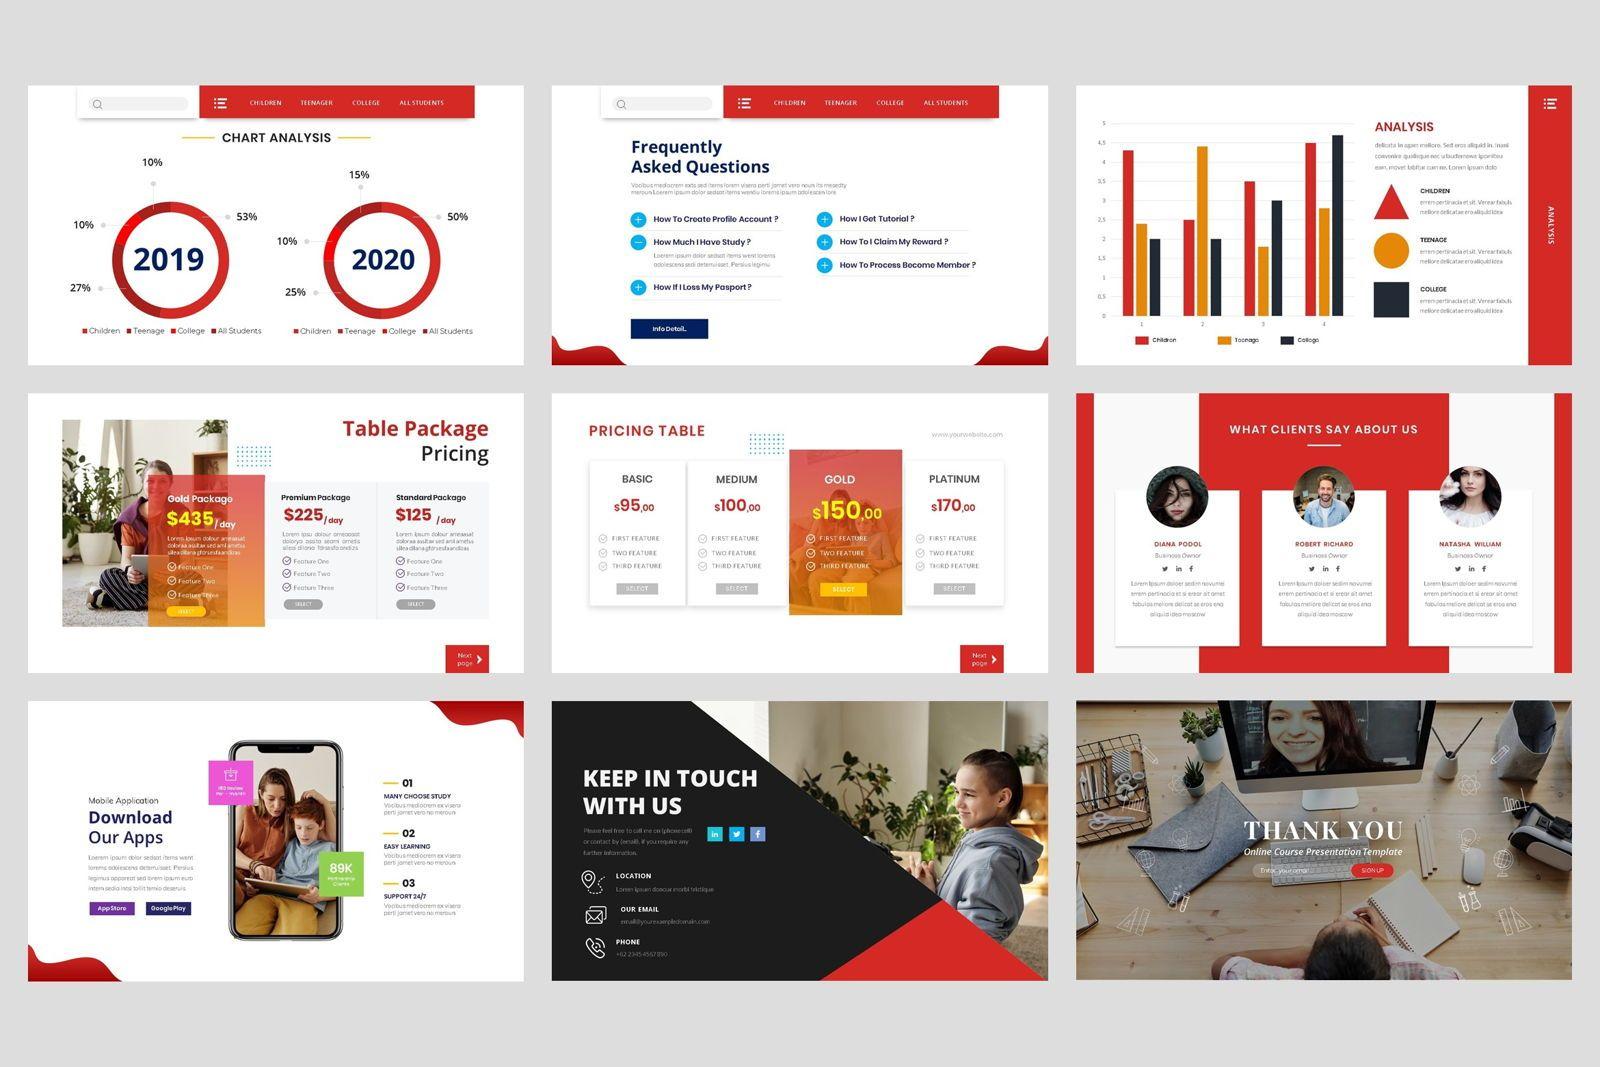 Online Course - Education Google Slide Template, Slide 5, 08574, Presentation Templates — PoweredTemplate.com